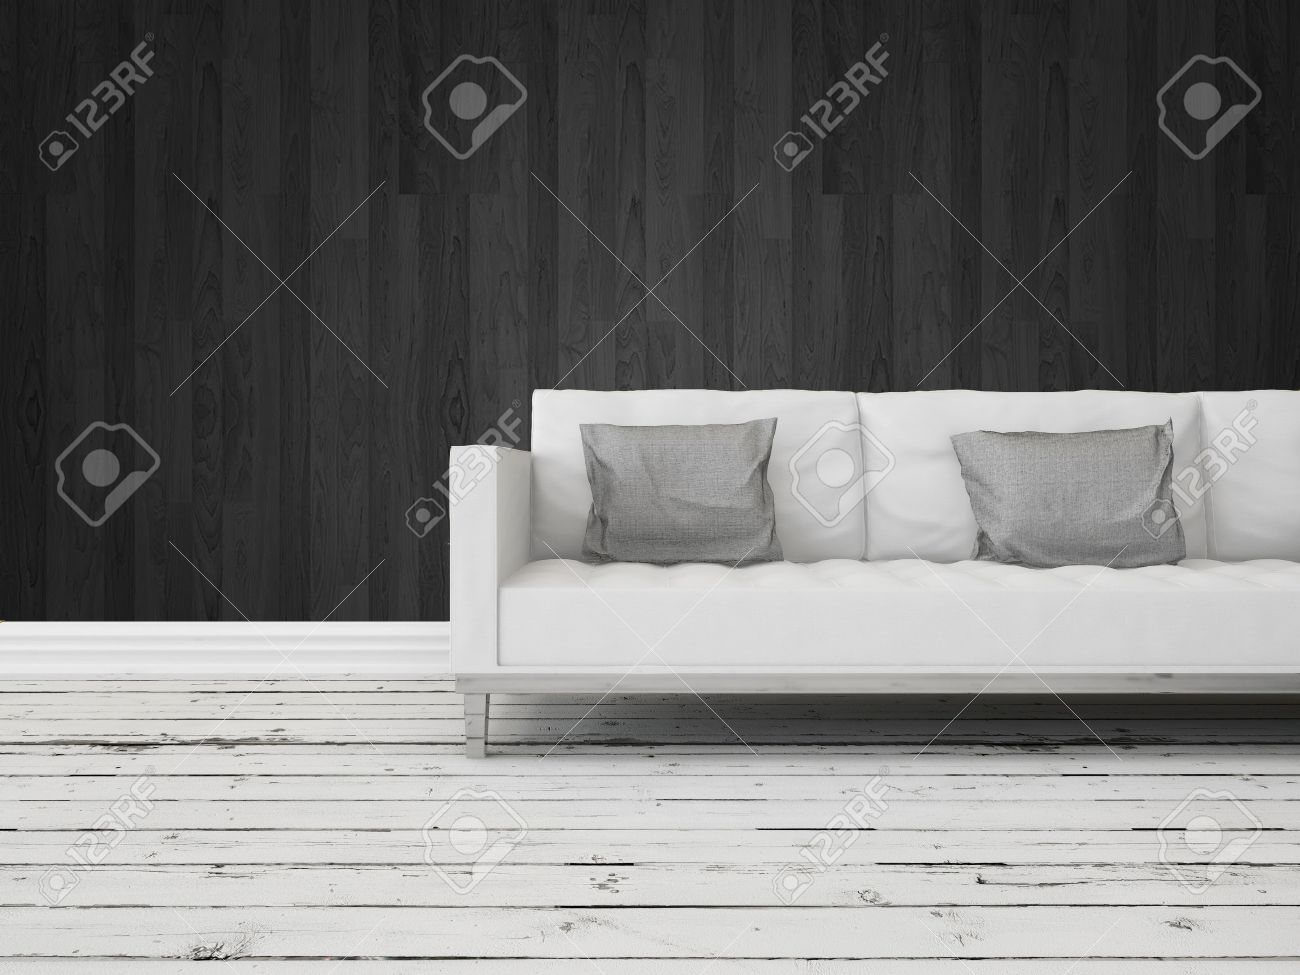 Donkere Vloer Donkere Bank: Donkere vloer meubels foto geplaatst ...